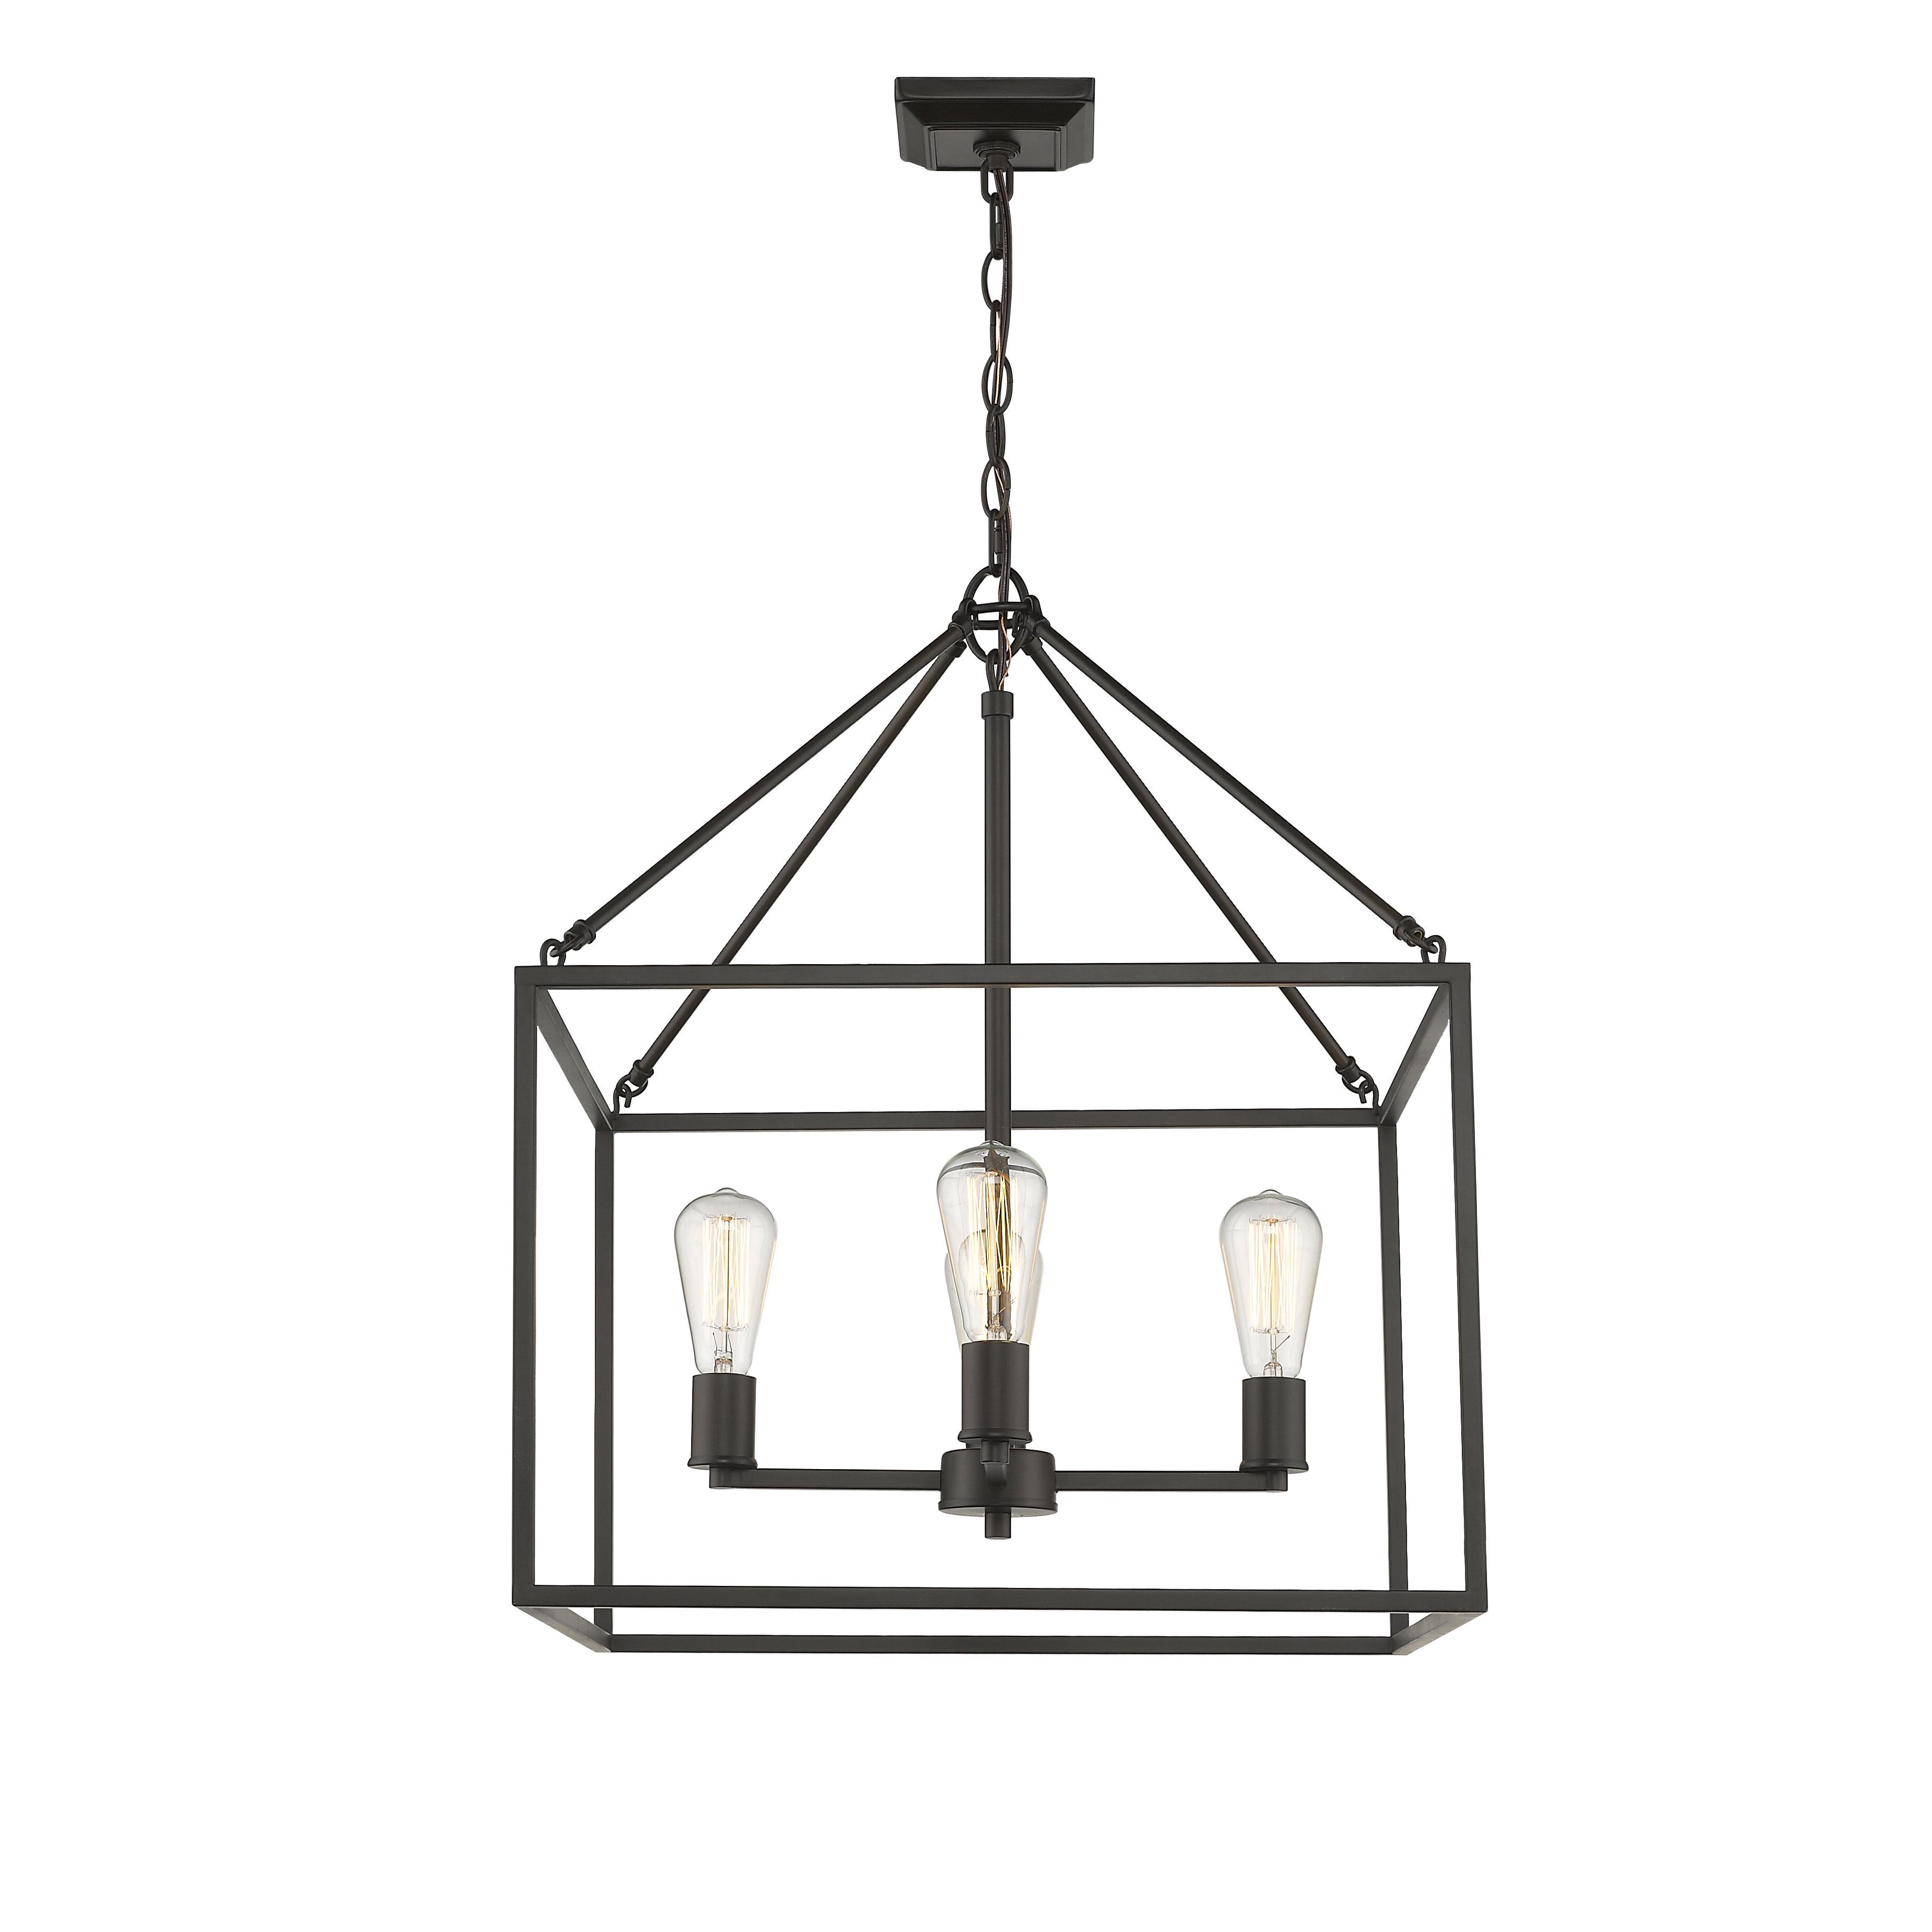 4 Light Lantern Square / Rectangle Pendants For Most Recently Released Zabel 4 Light Lantern Square / Rectangle Pendant (Gallery 10 of 20)